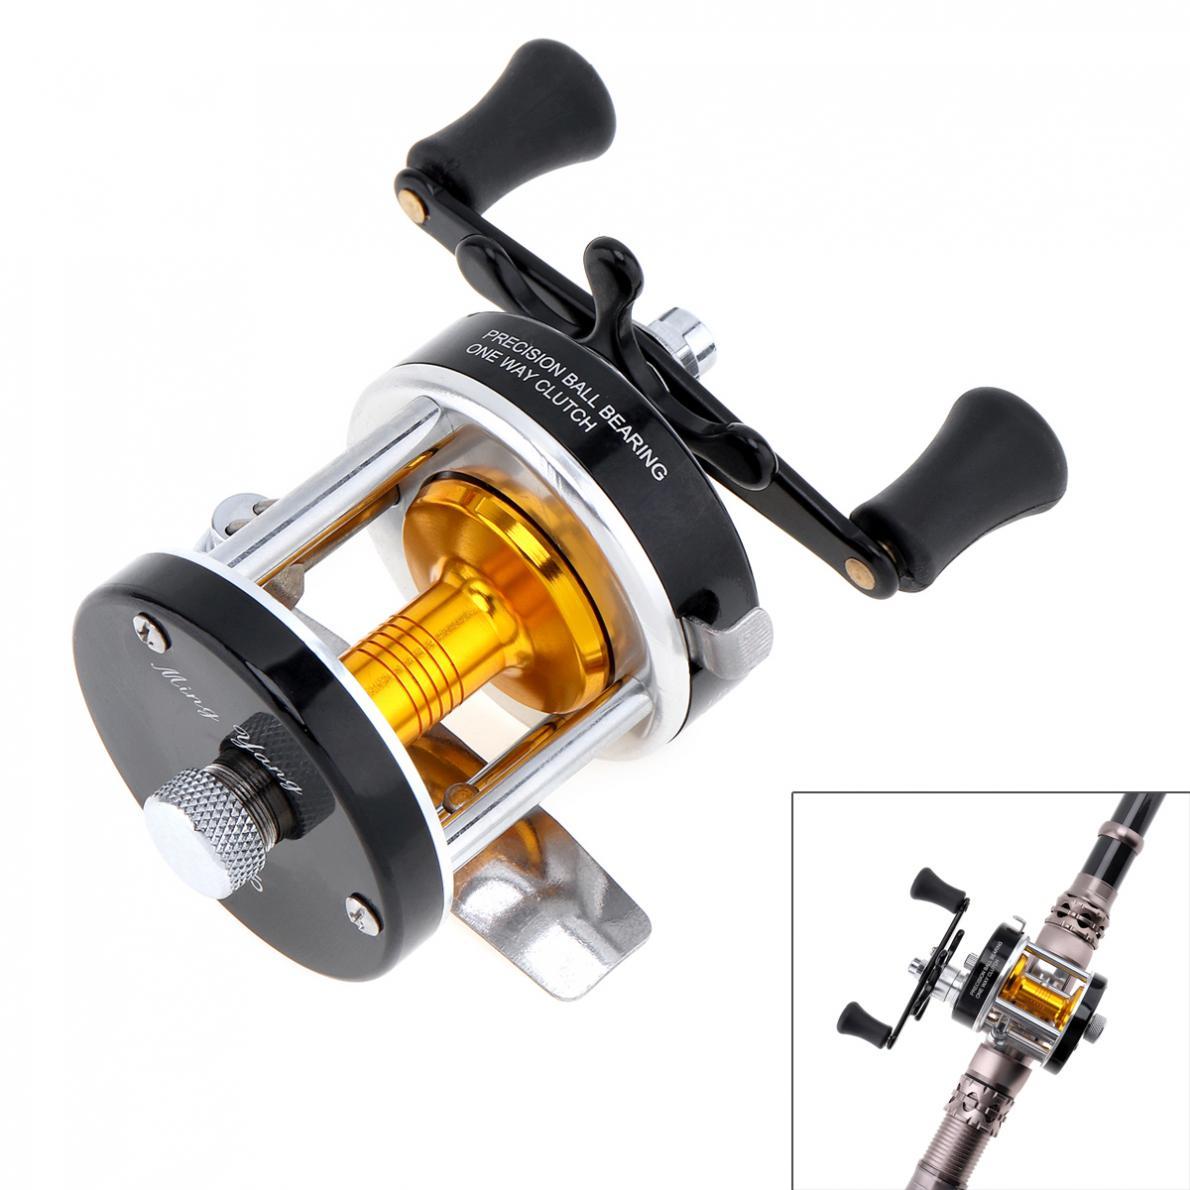 Metal Drum Fishing Reel Gear Ratio 3.8:1 Right Hand Trolling Reel Casting Sea Fishing Reel Saltwater Bait Casting Reel Coil